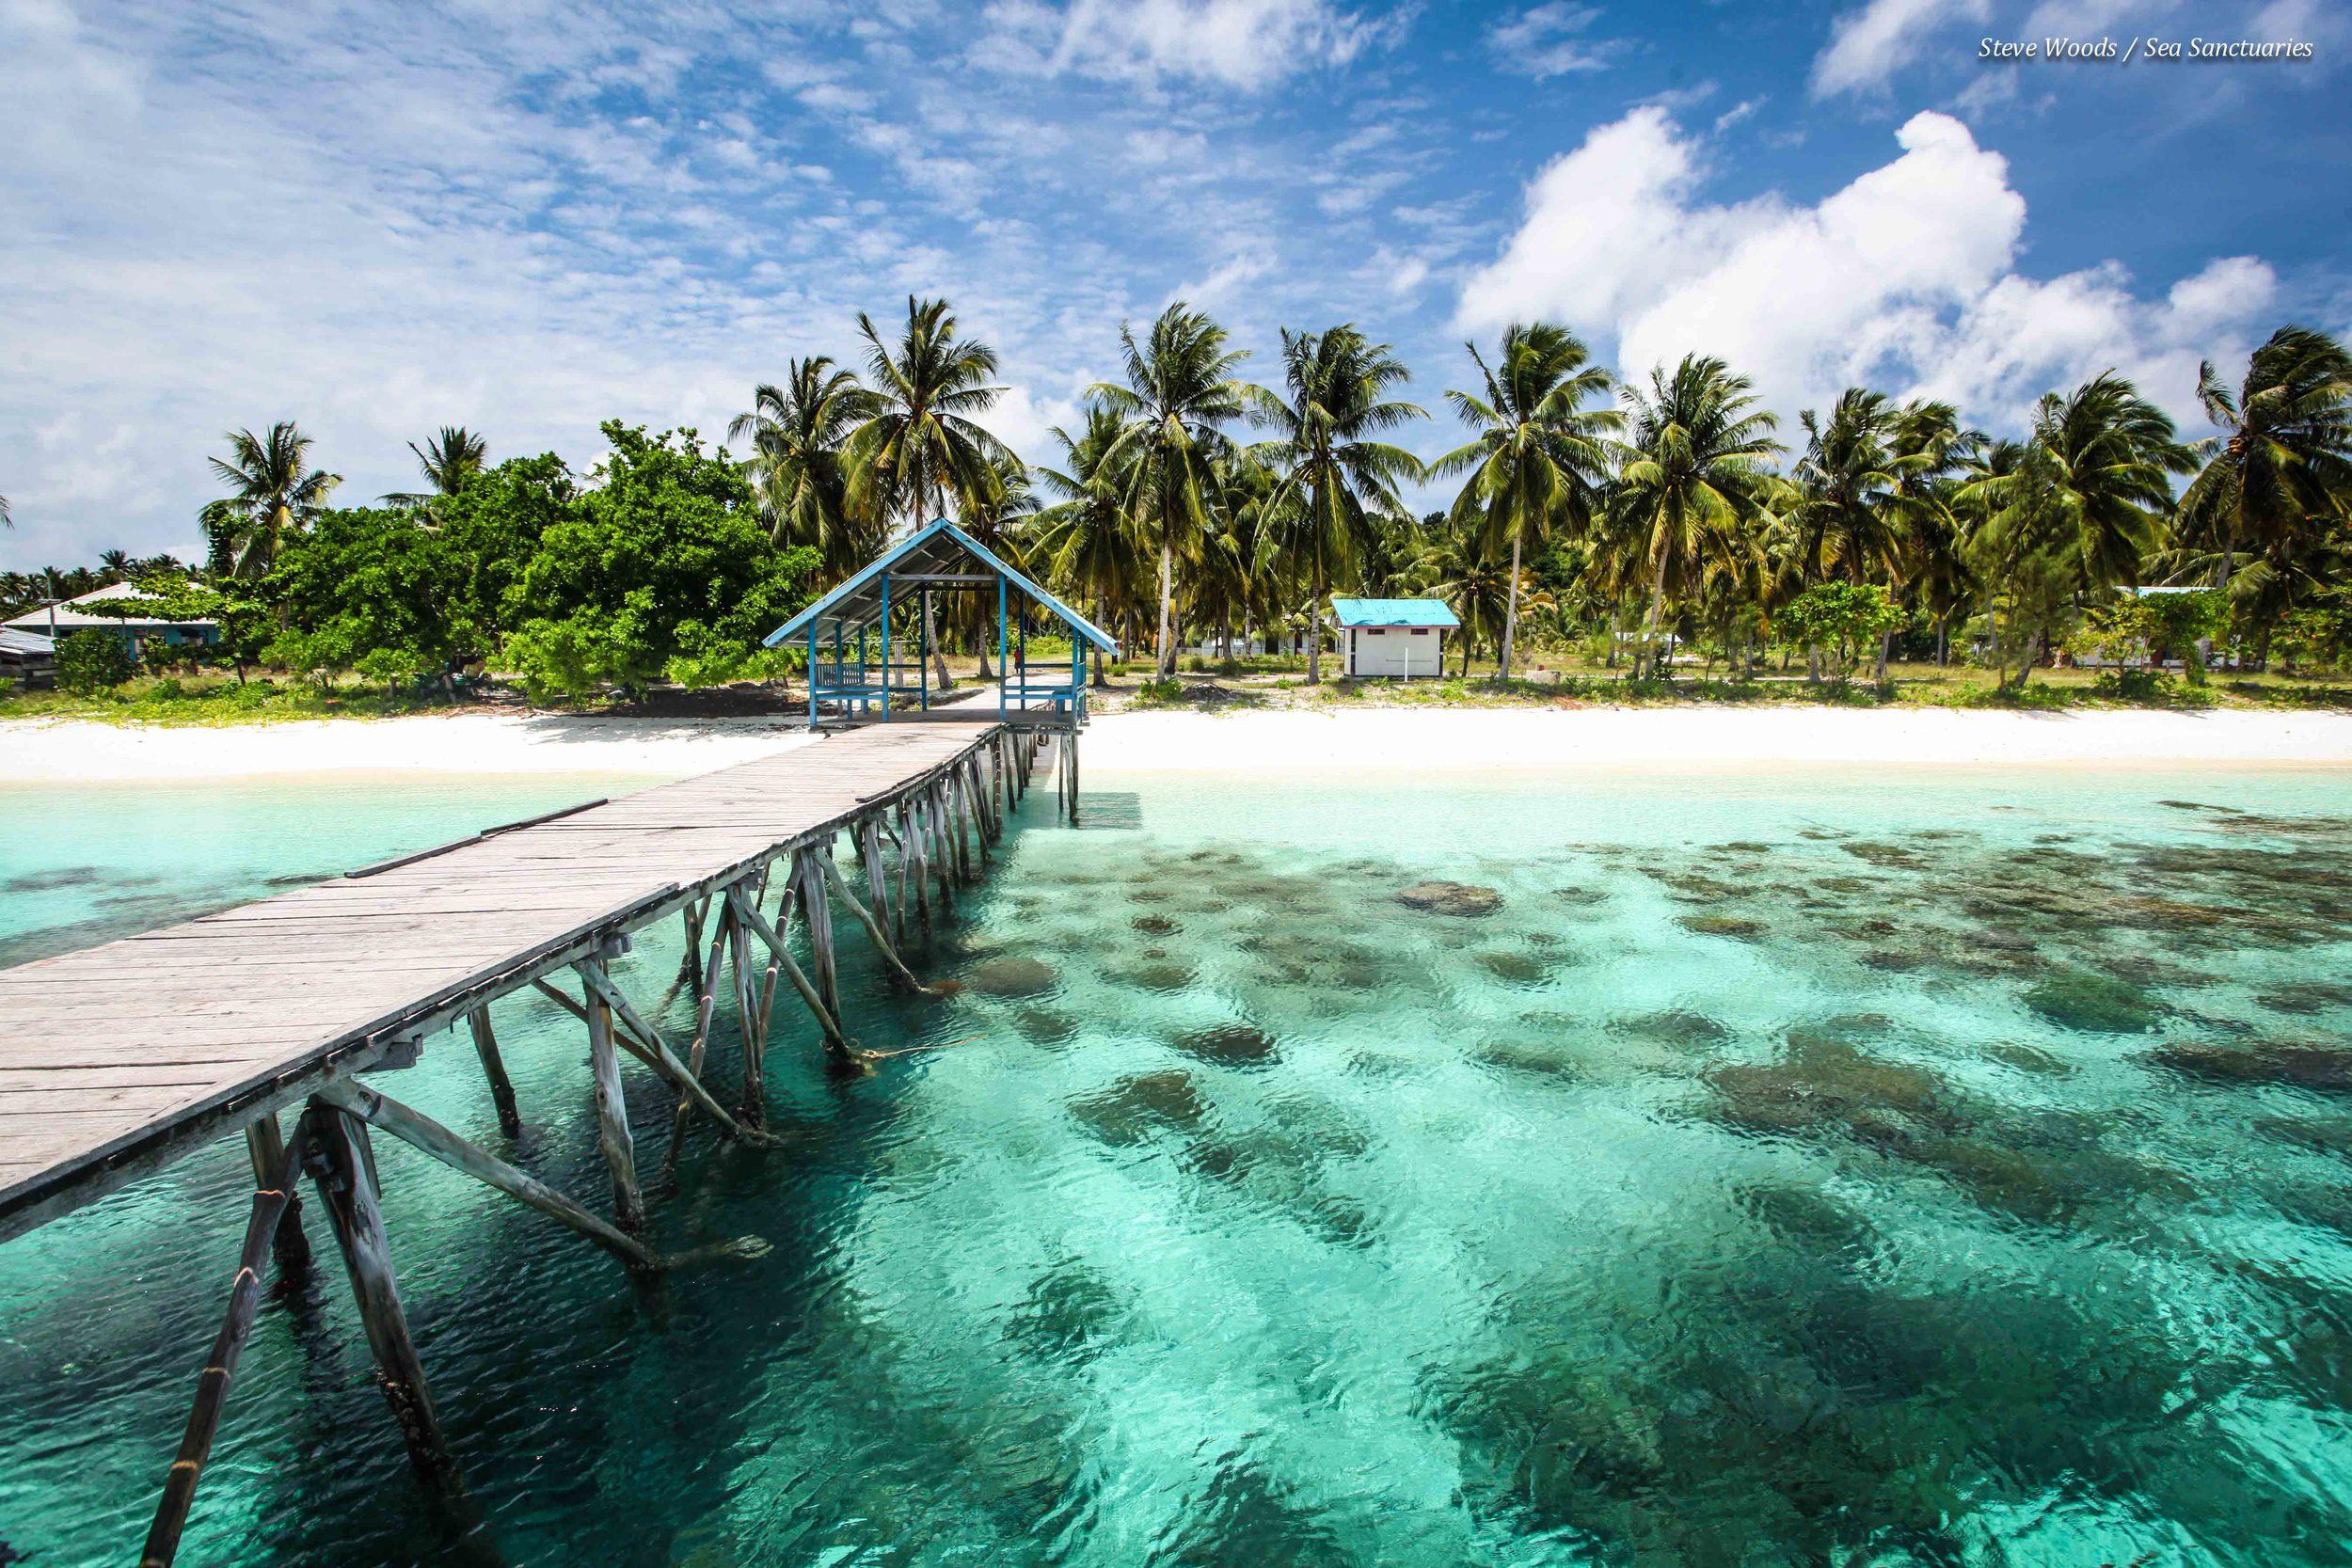 Saukabu Village on the island of Fam